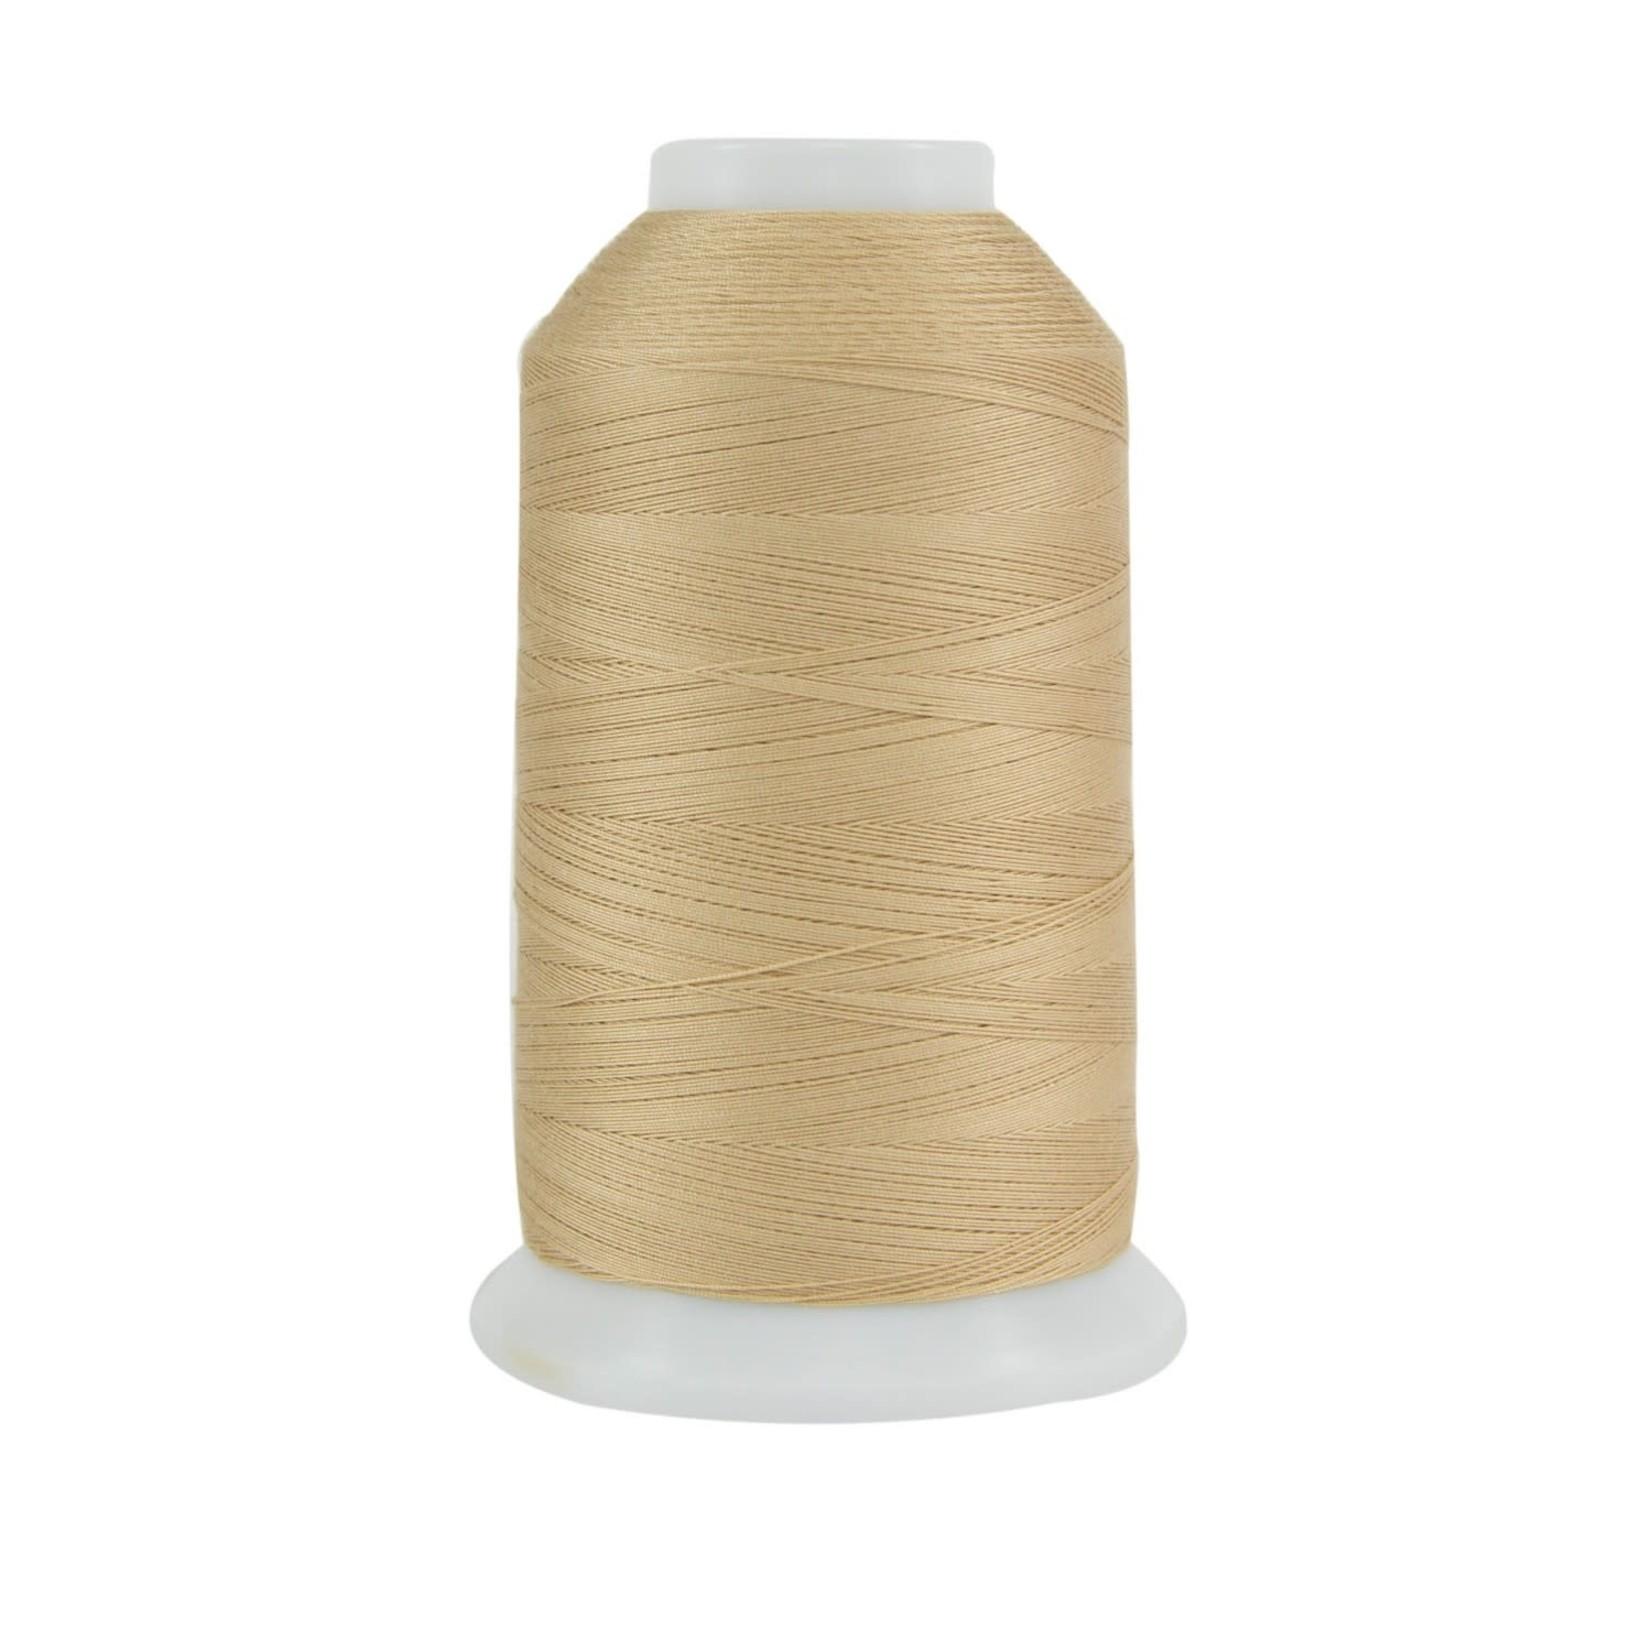 Superior Threads King Tut - #40 - 1828 m - 0973 Flax